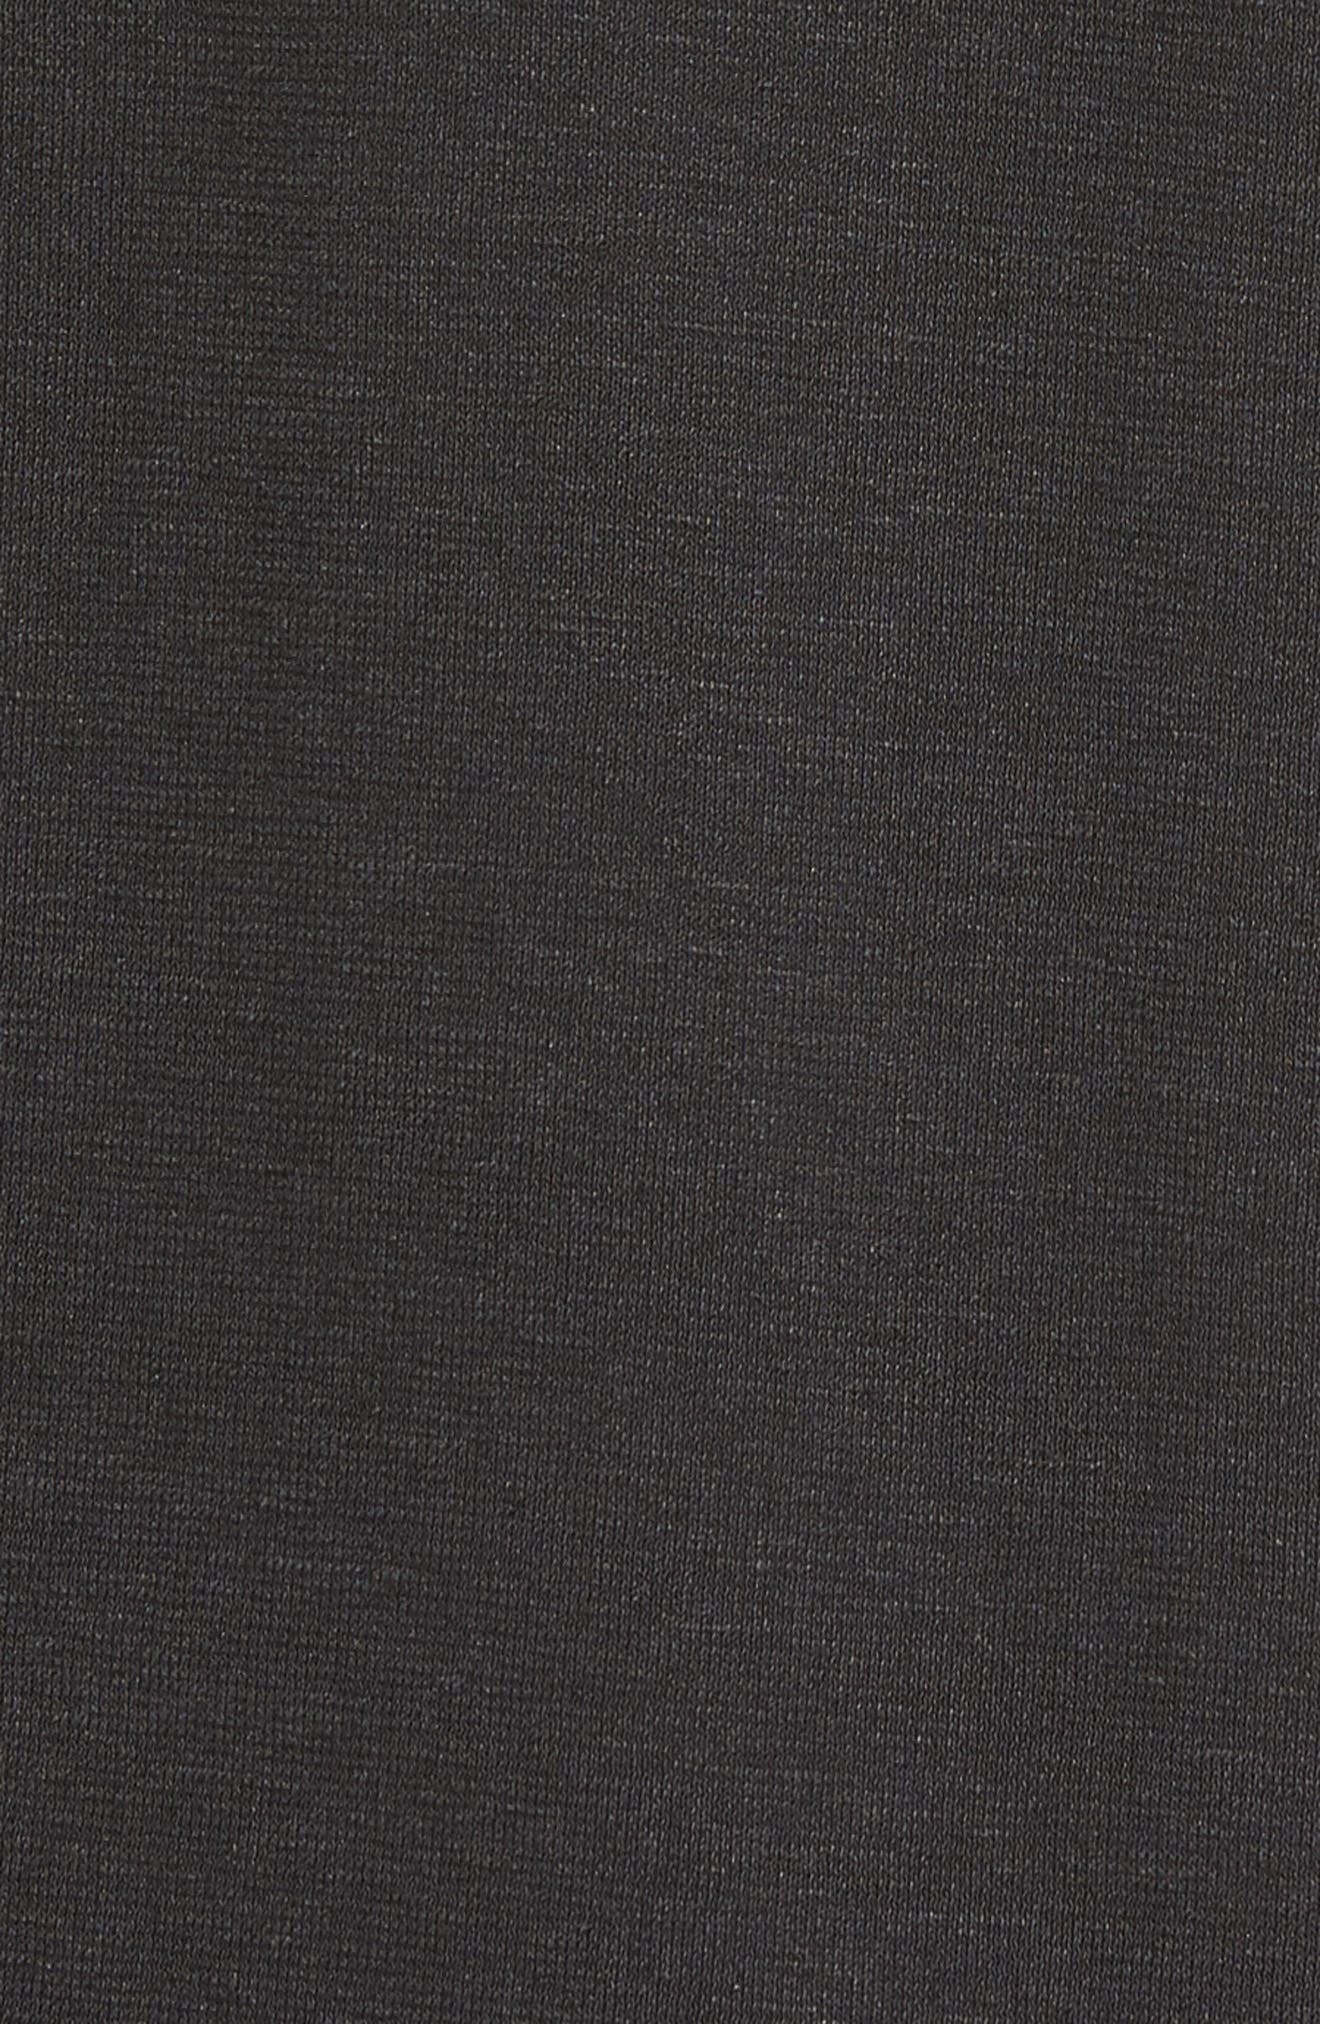 Camura T-Shirt,                             Alternate thumbnail 5, color,                             002